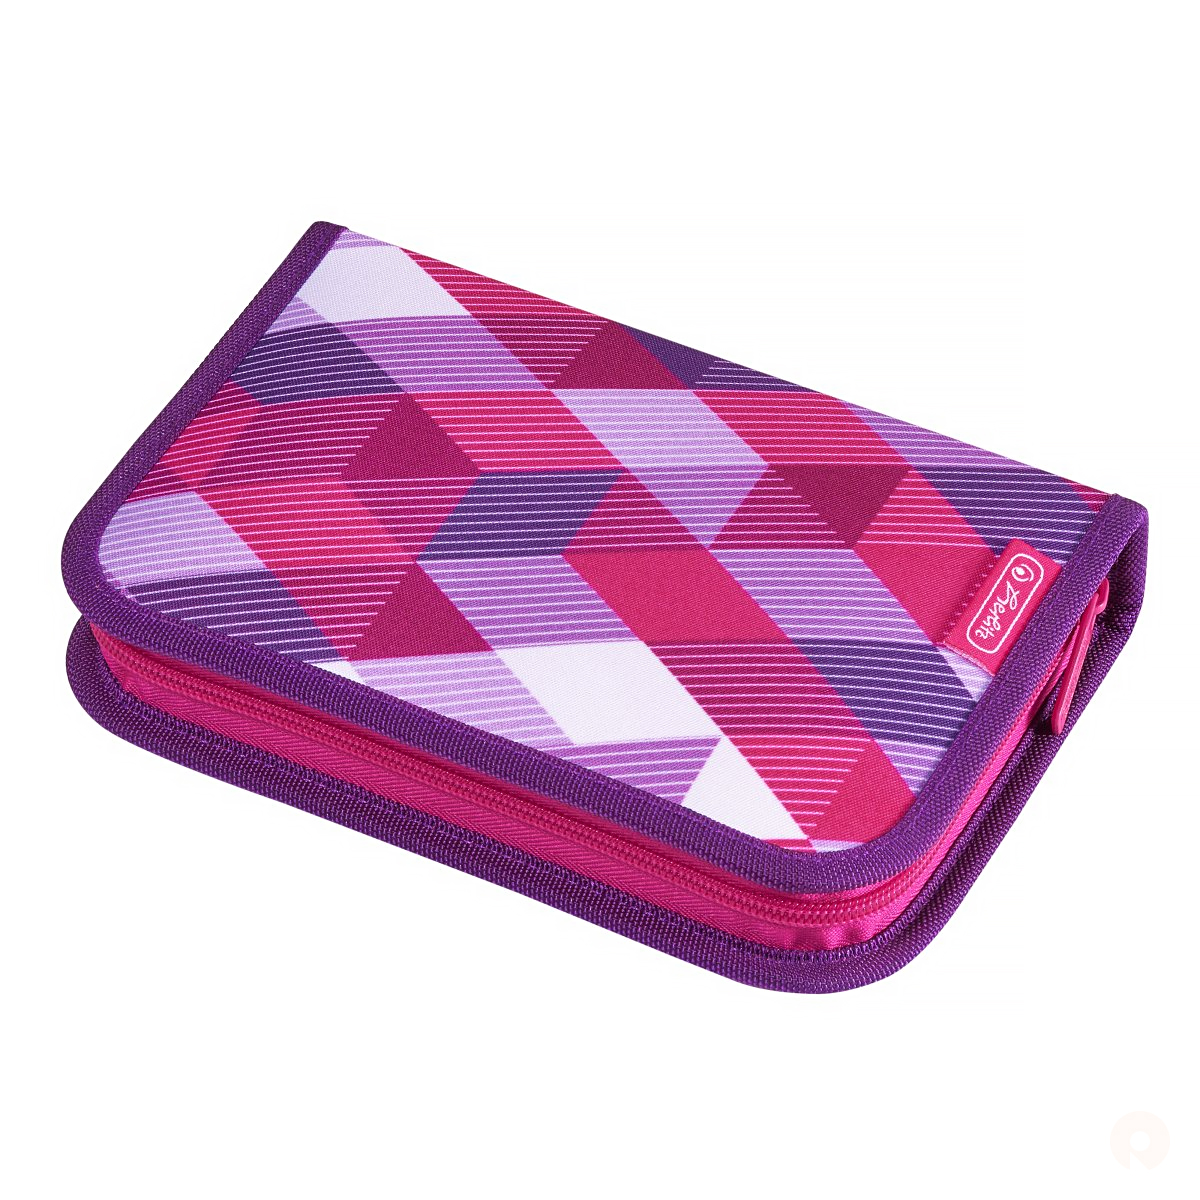 Penar Echipat, 31 Piese, Motiv Pink Cubes, Herlitz, 50020973